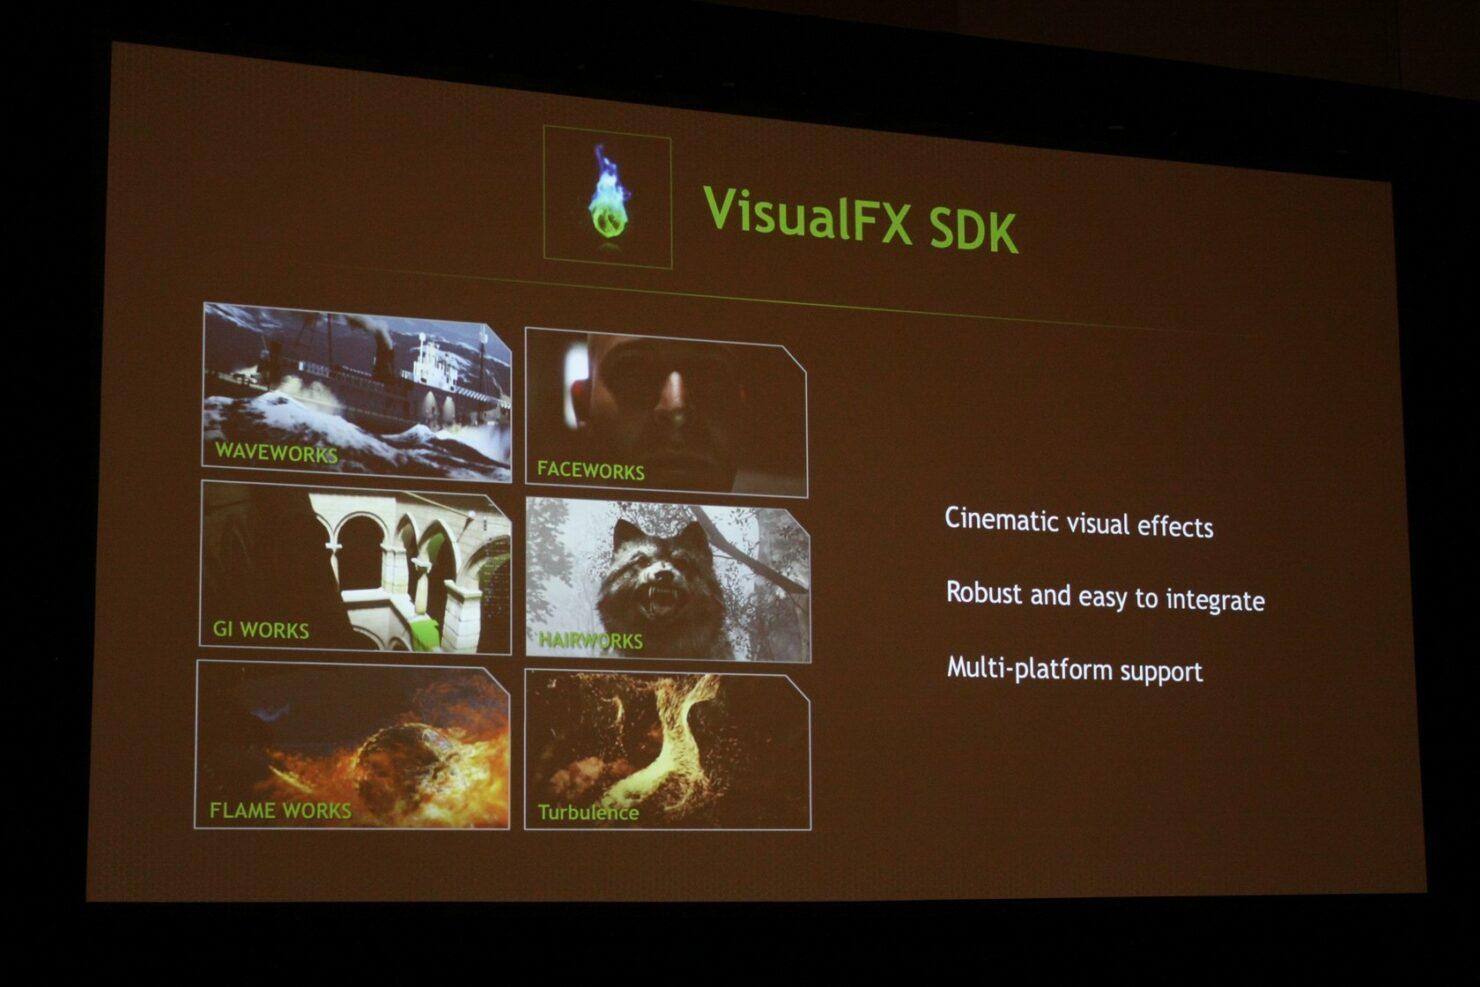 nvidia-visualfx-sdk